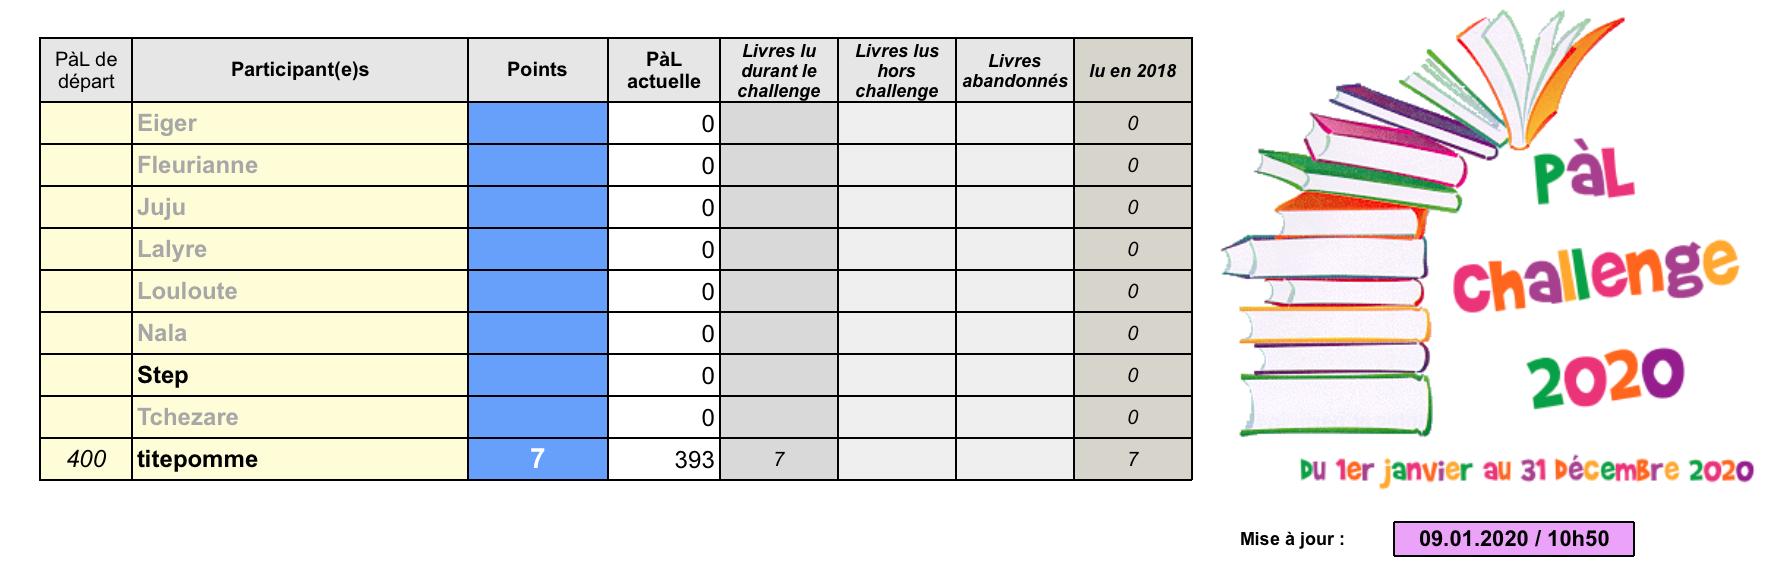 °°PàL Challenge 2020°° Capt1129